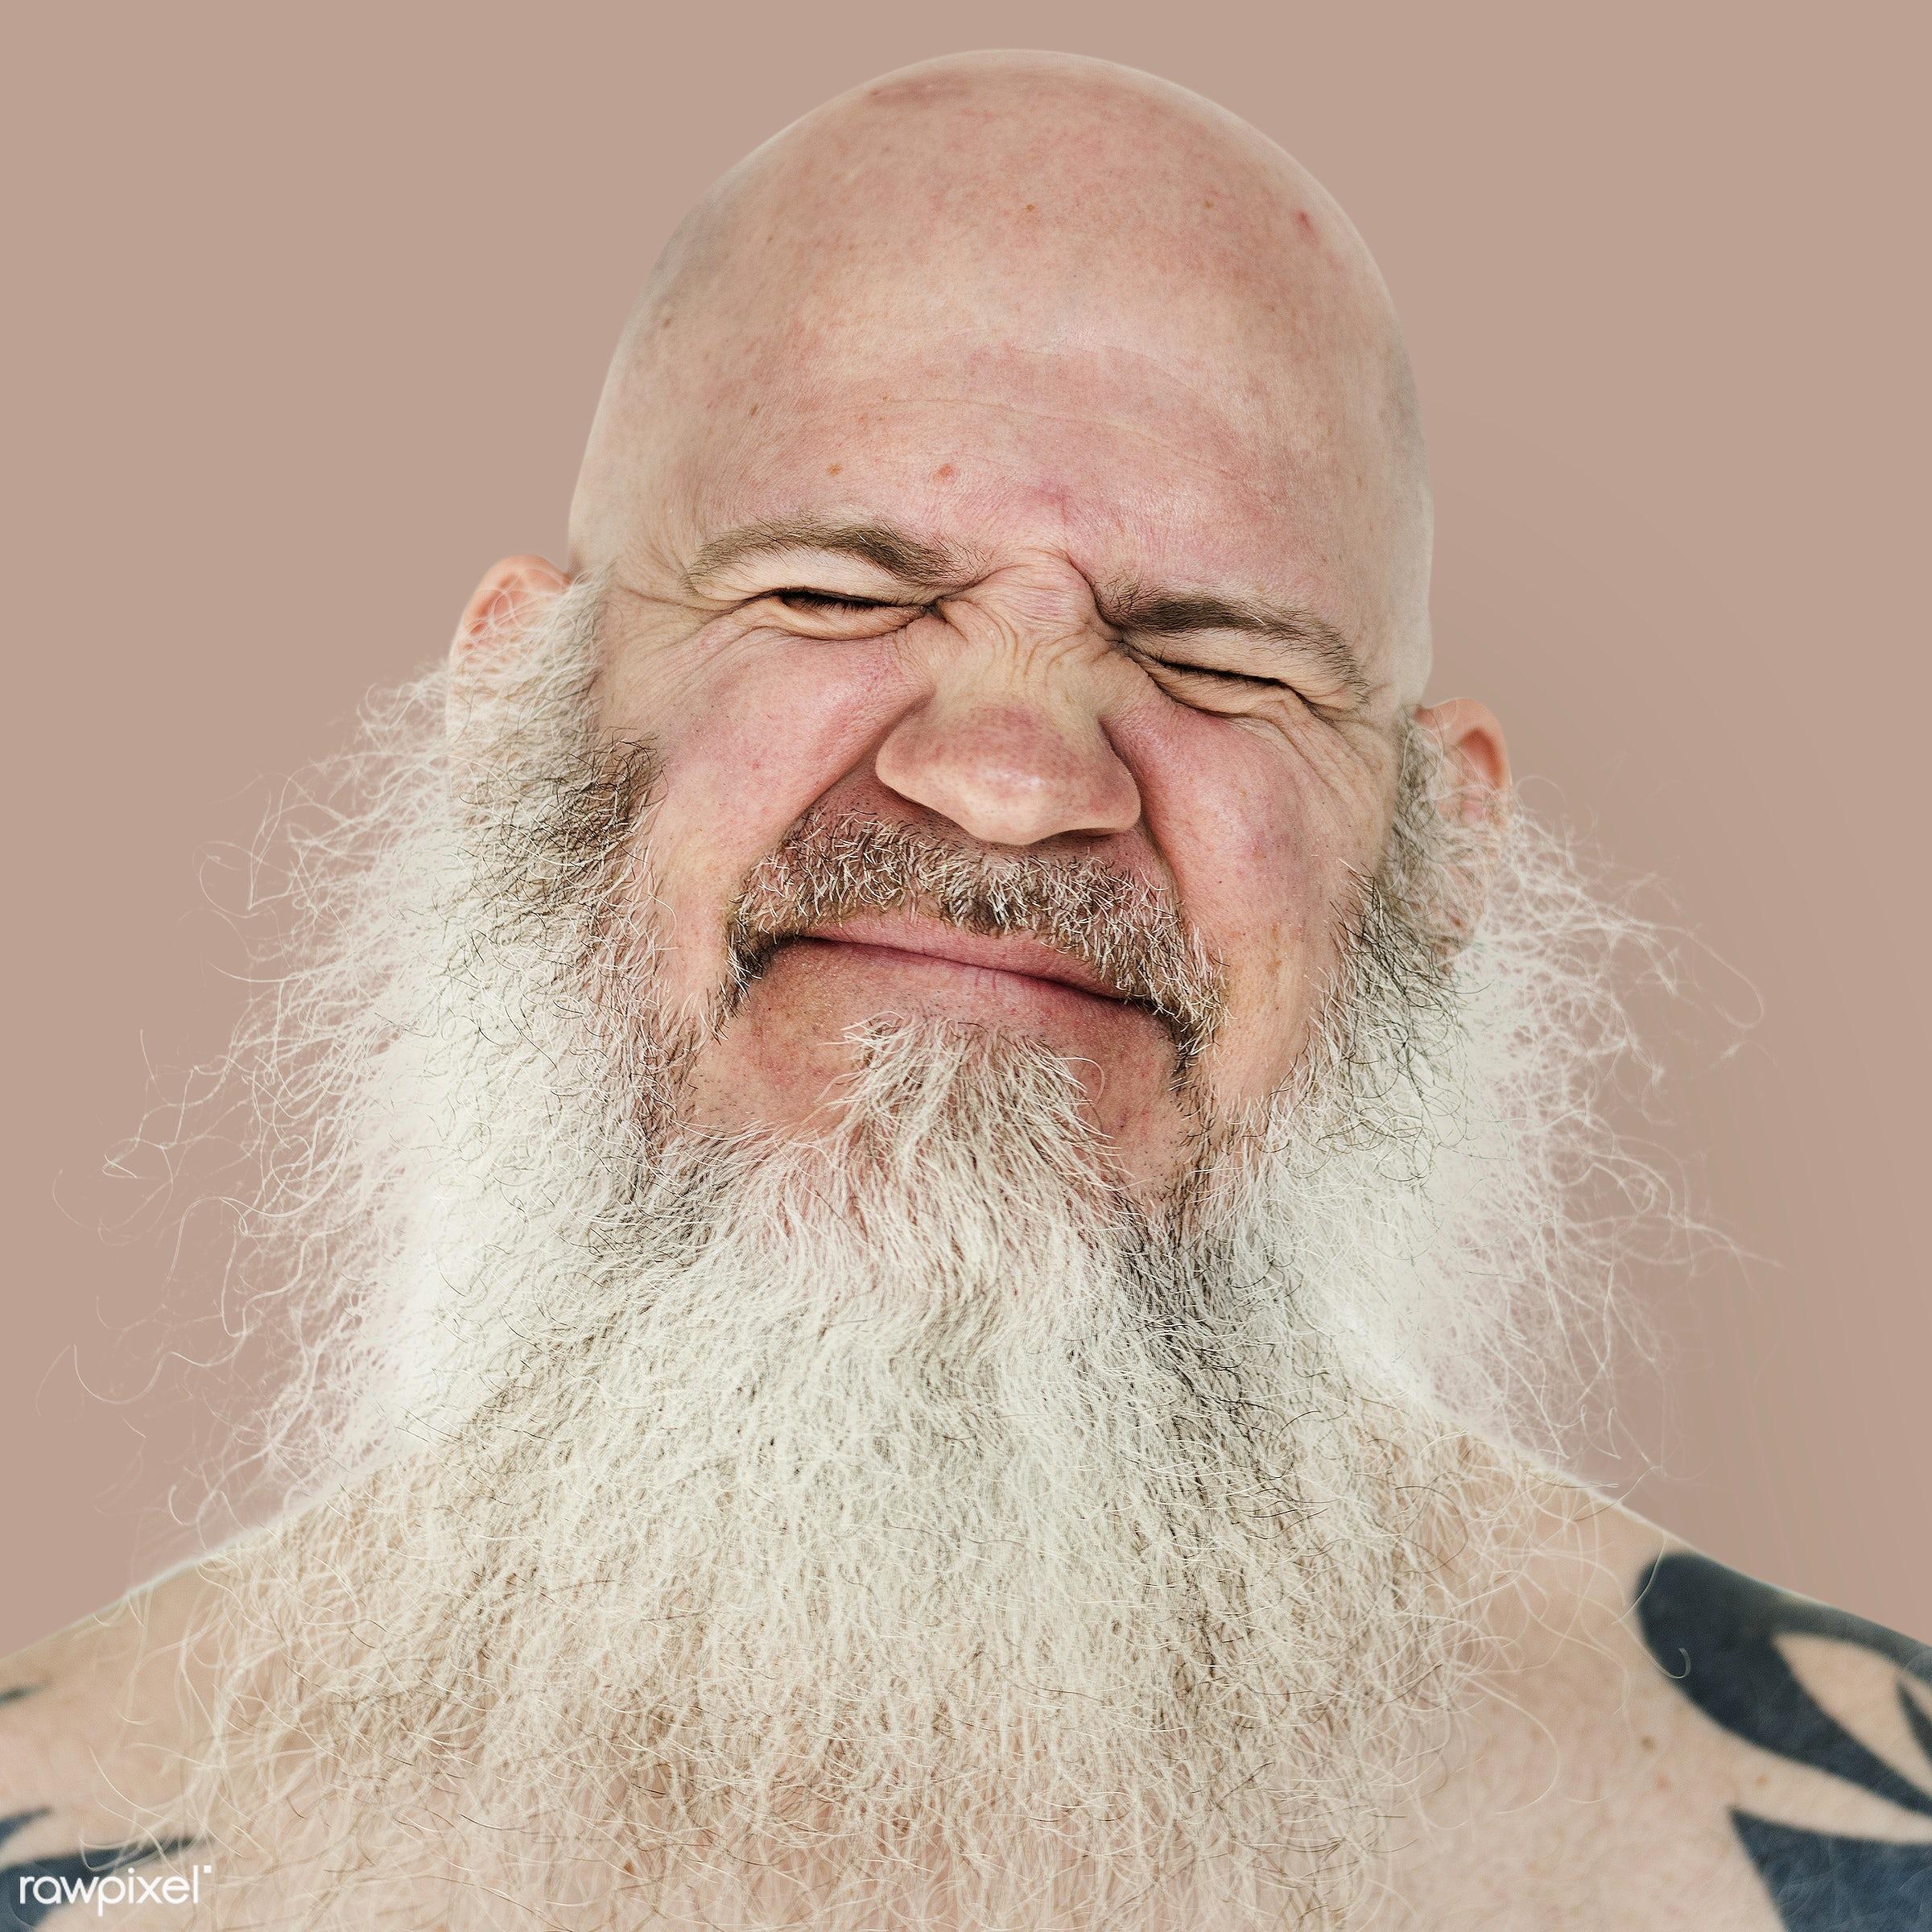 Portrait of an American man - usa, america, american, art, bald, beard, closeup, emotion, expression, face, guy, man, person...